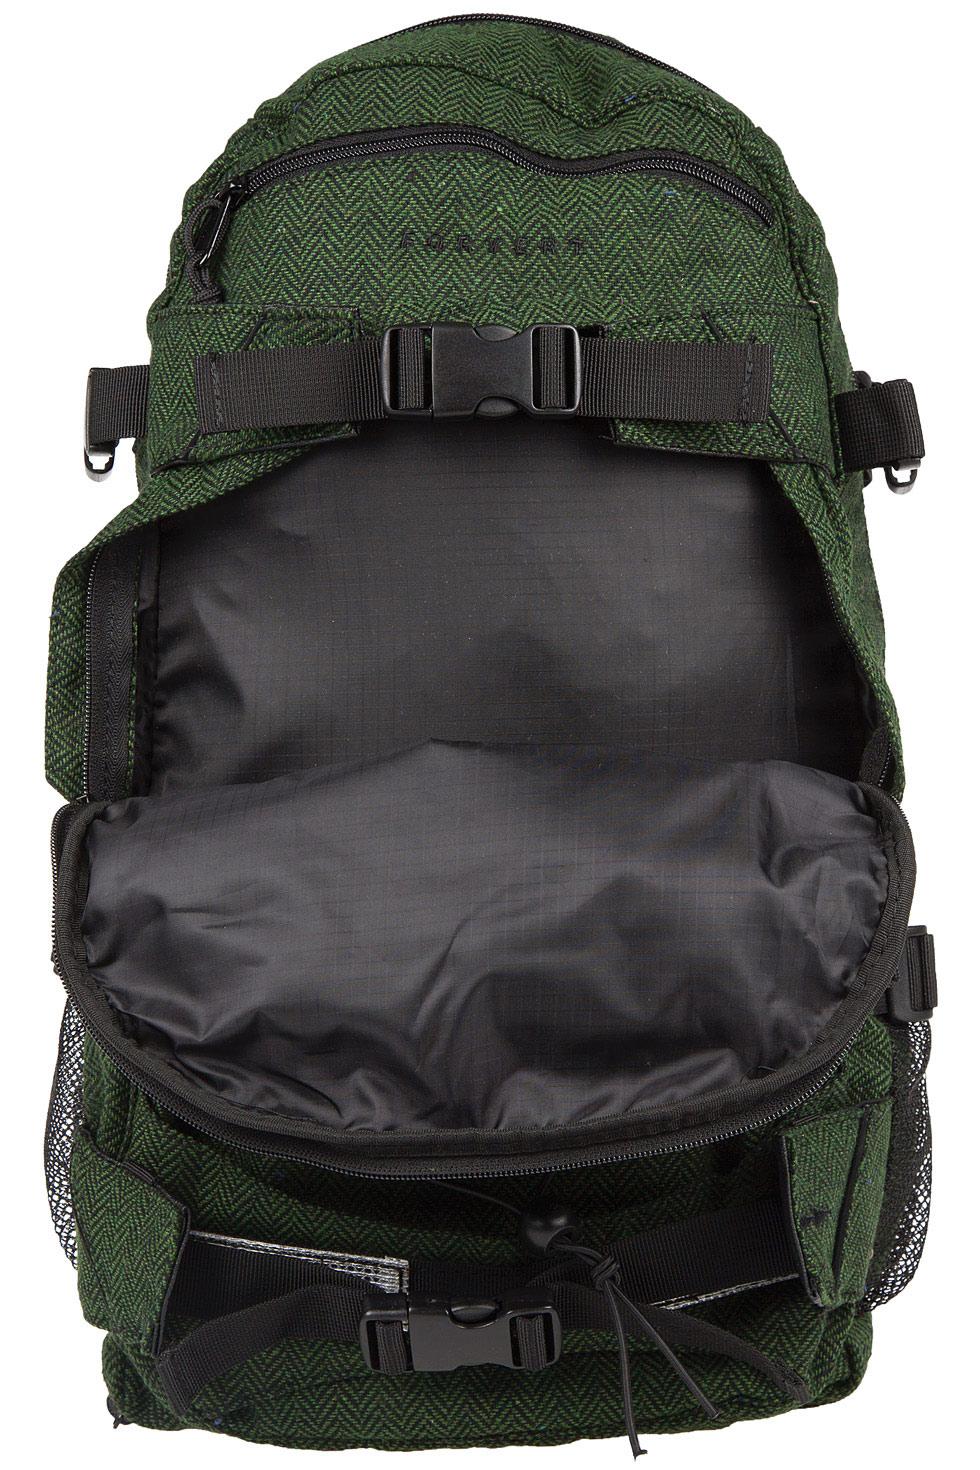 forvert new louis backpack 20l flannel green buy at skatedeluxe. Black Bedroom Furniture Sets. Home Design Ideas